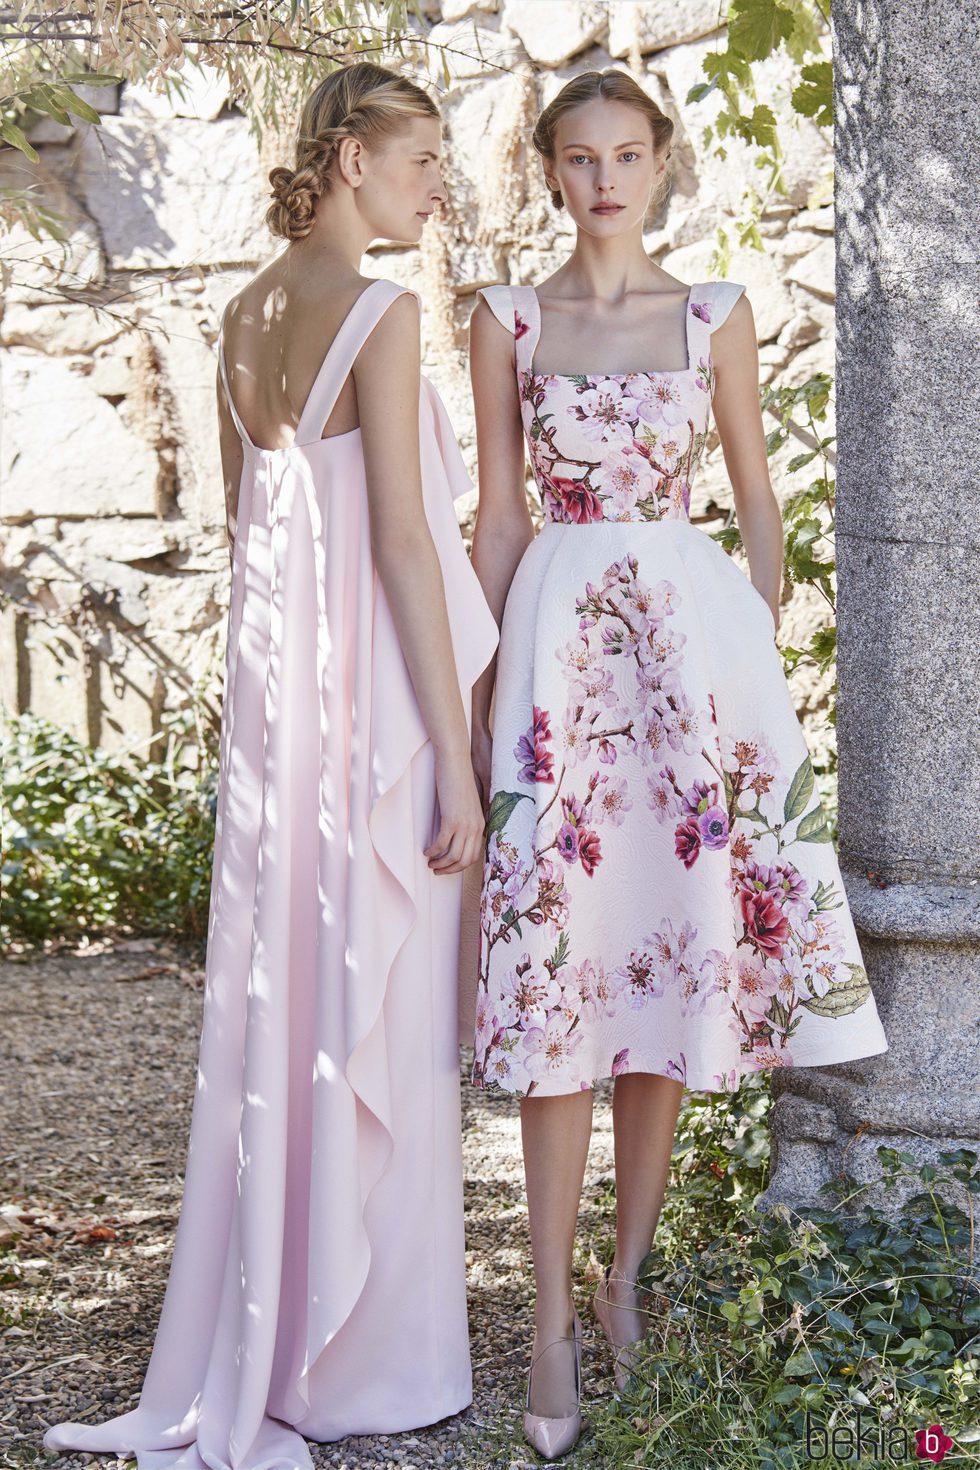 Vestidos color rosa cuarzo de dolores promesas primavera verano 2017 colecci n de looks - Colores moda primavera verano 2017 ...